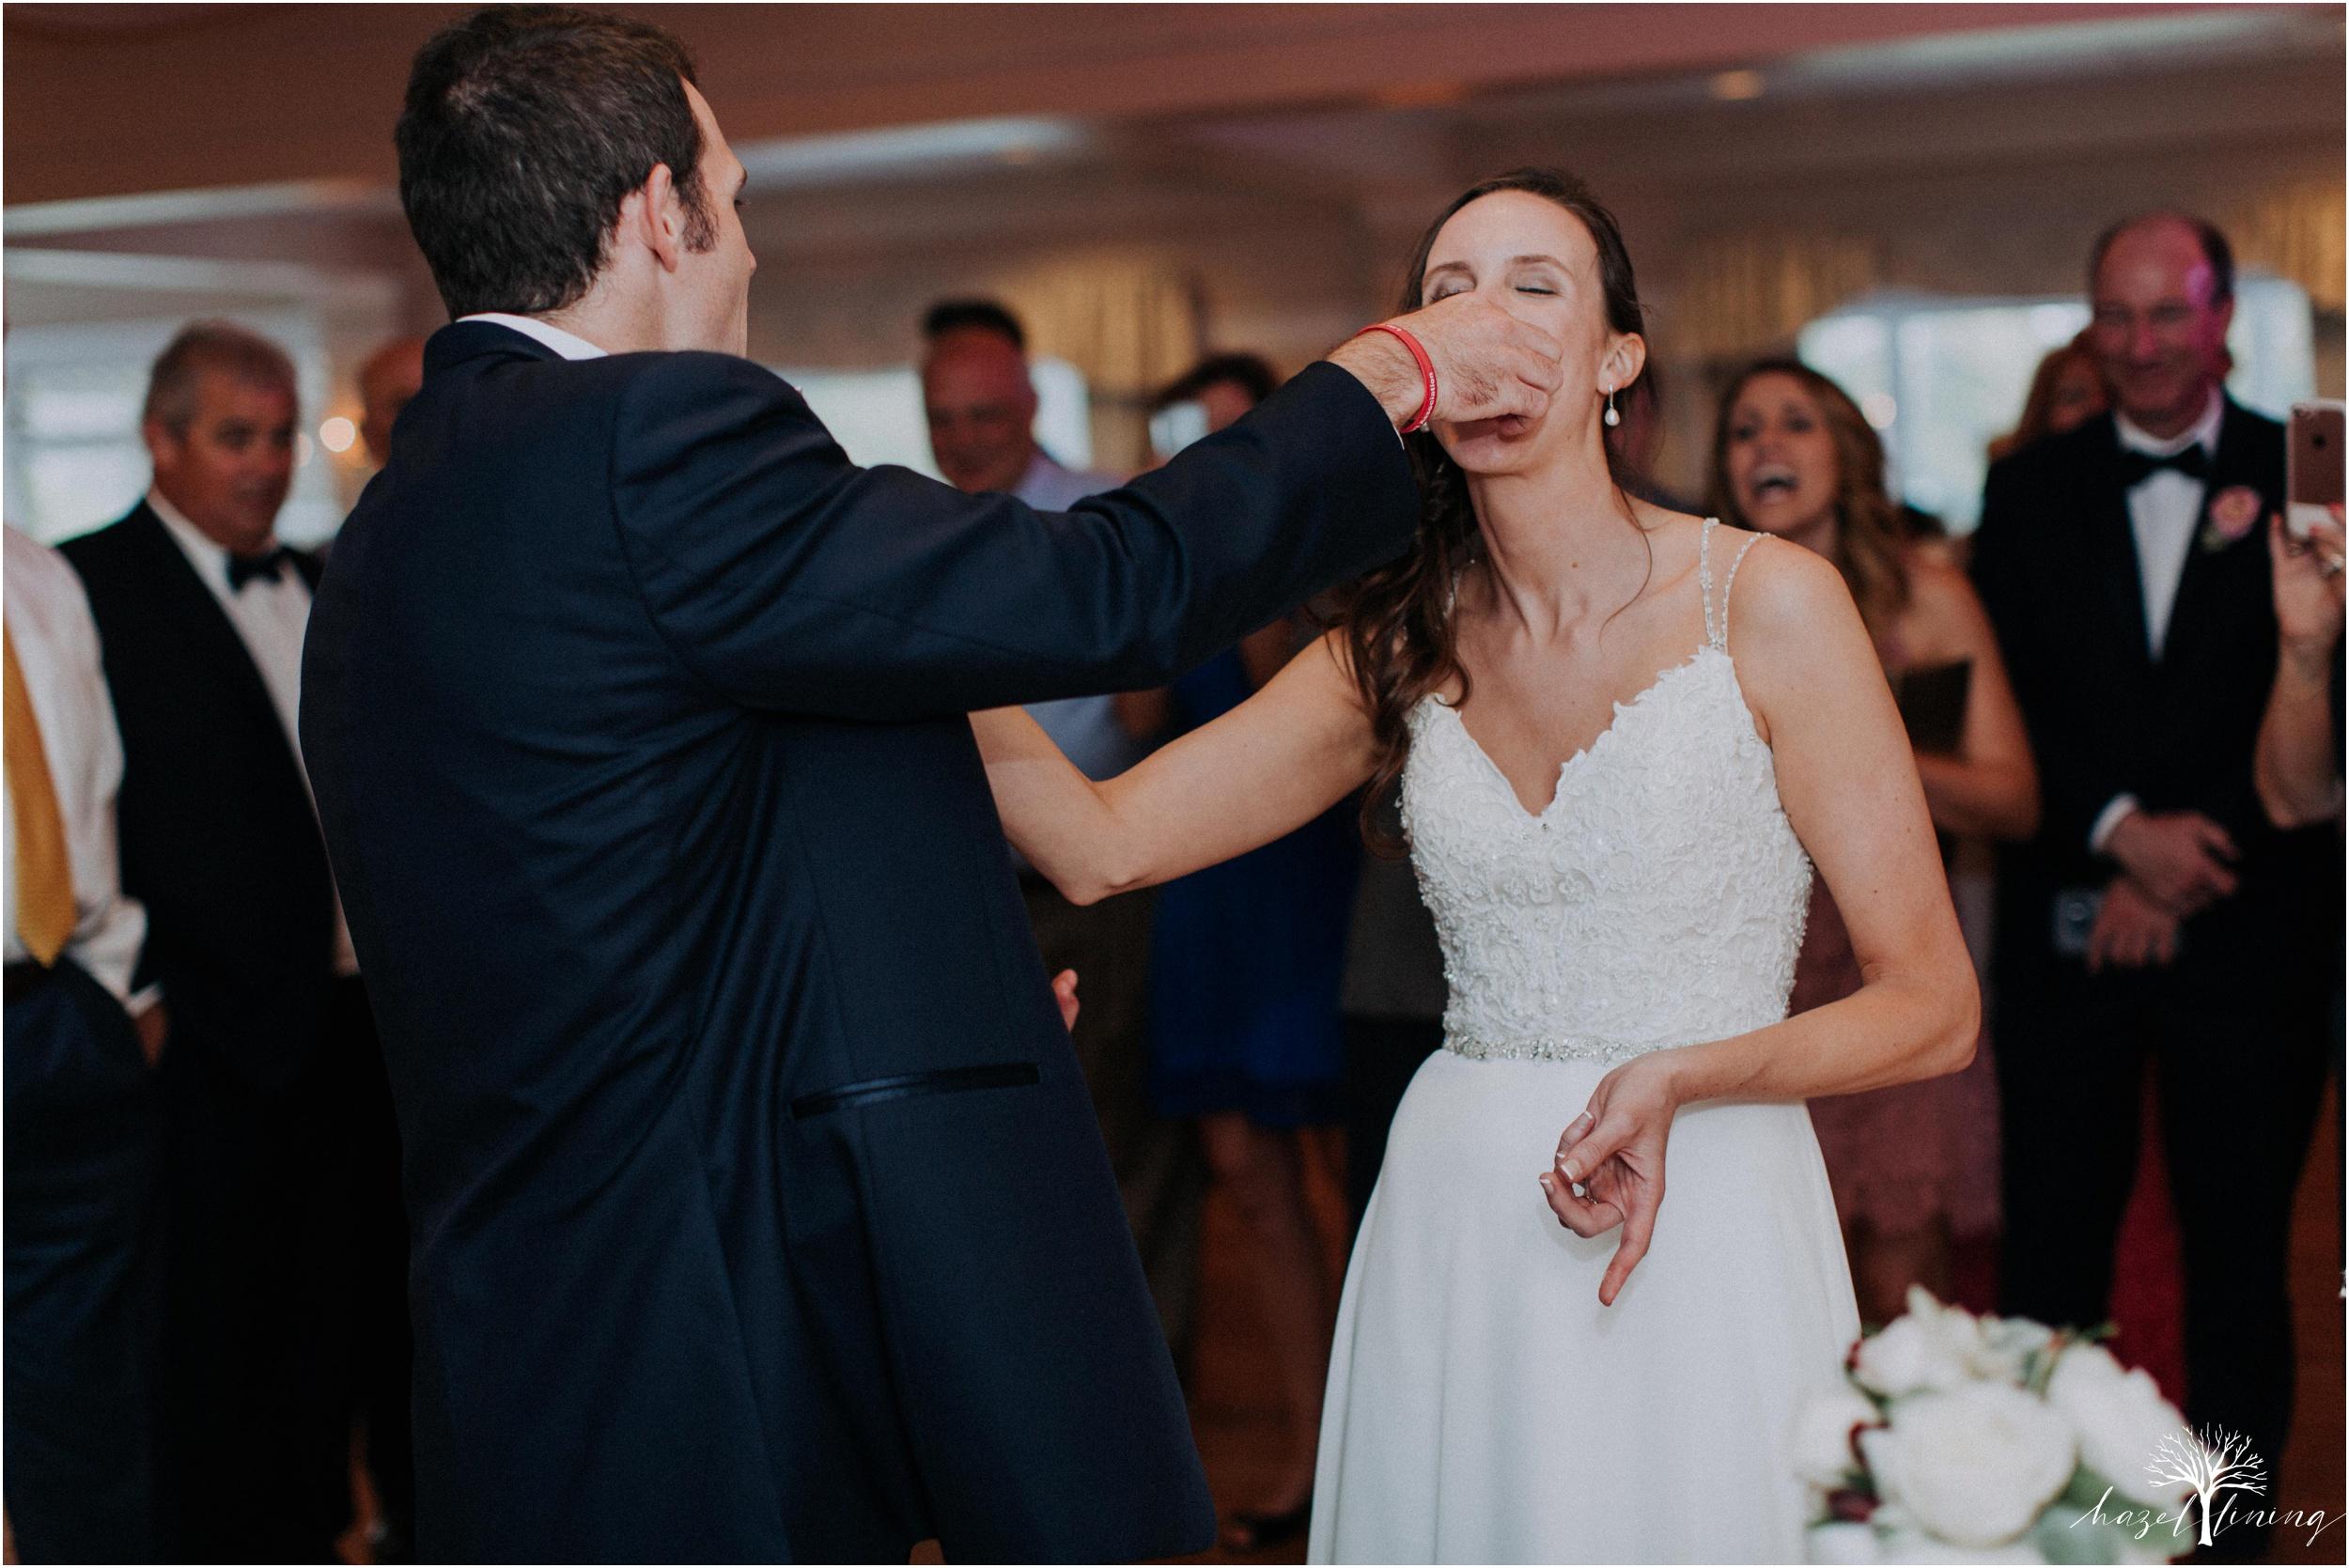 hazel-lining-travel-wedding-elopement-photography_0150.jpg